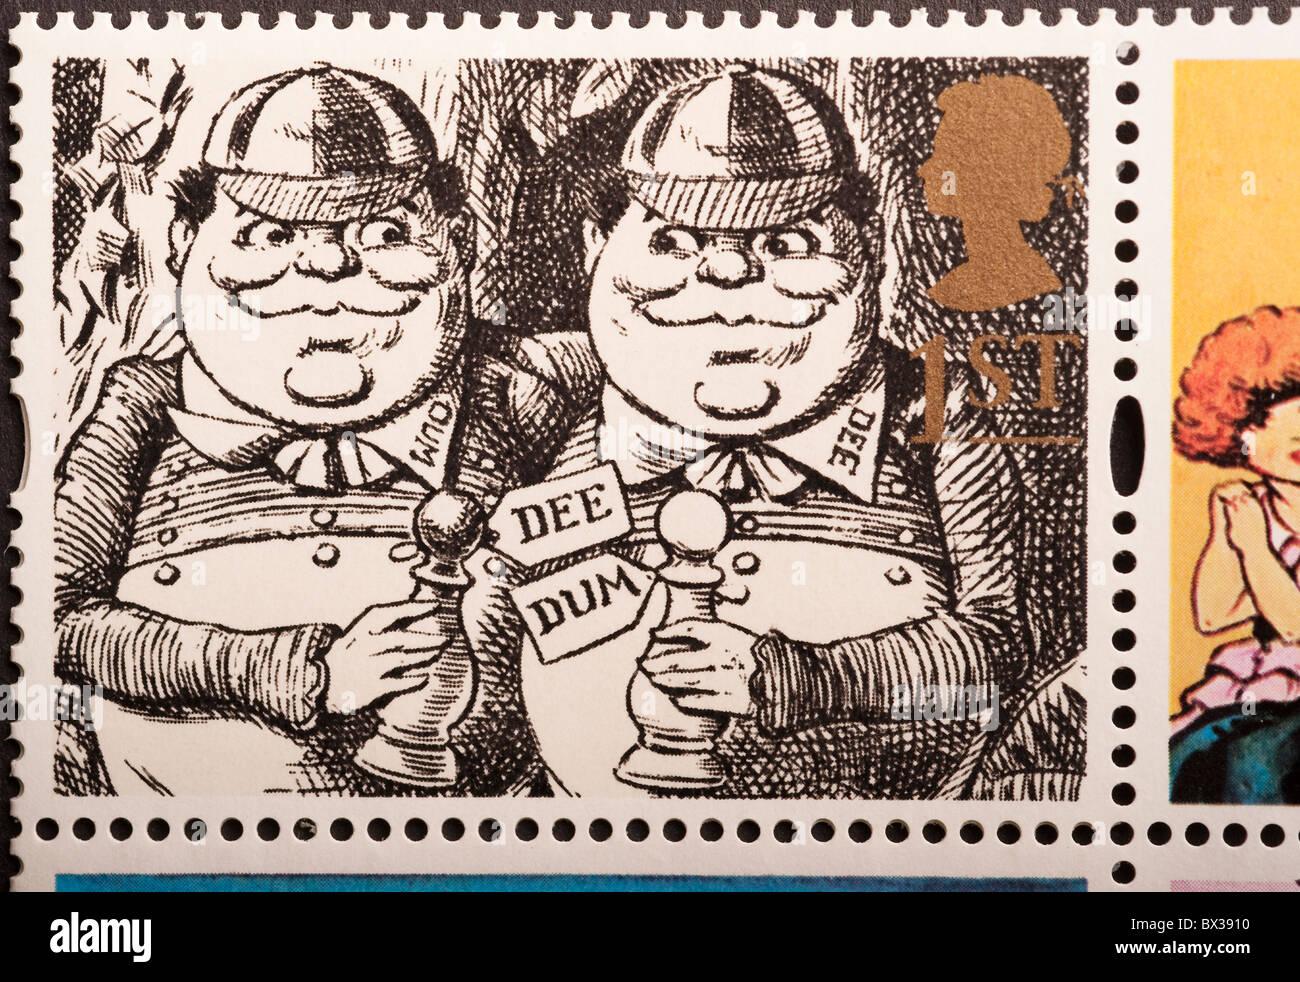 United Kingdom Postage Stamp 1st - Stock Image